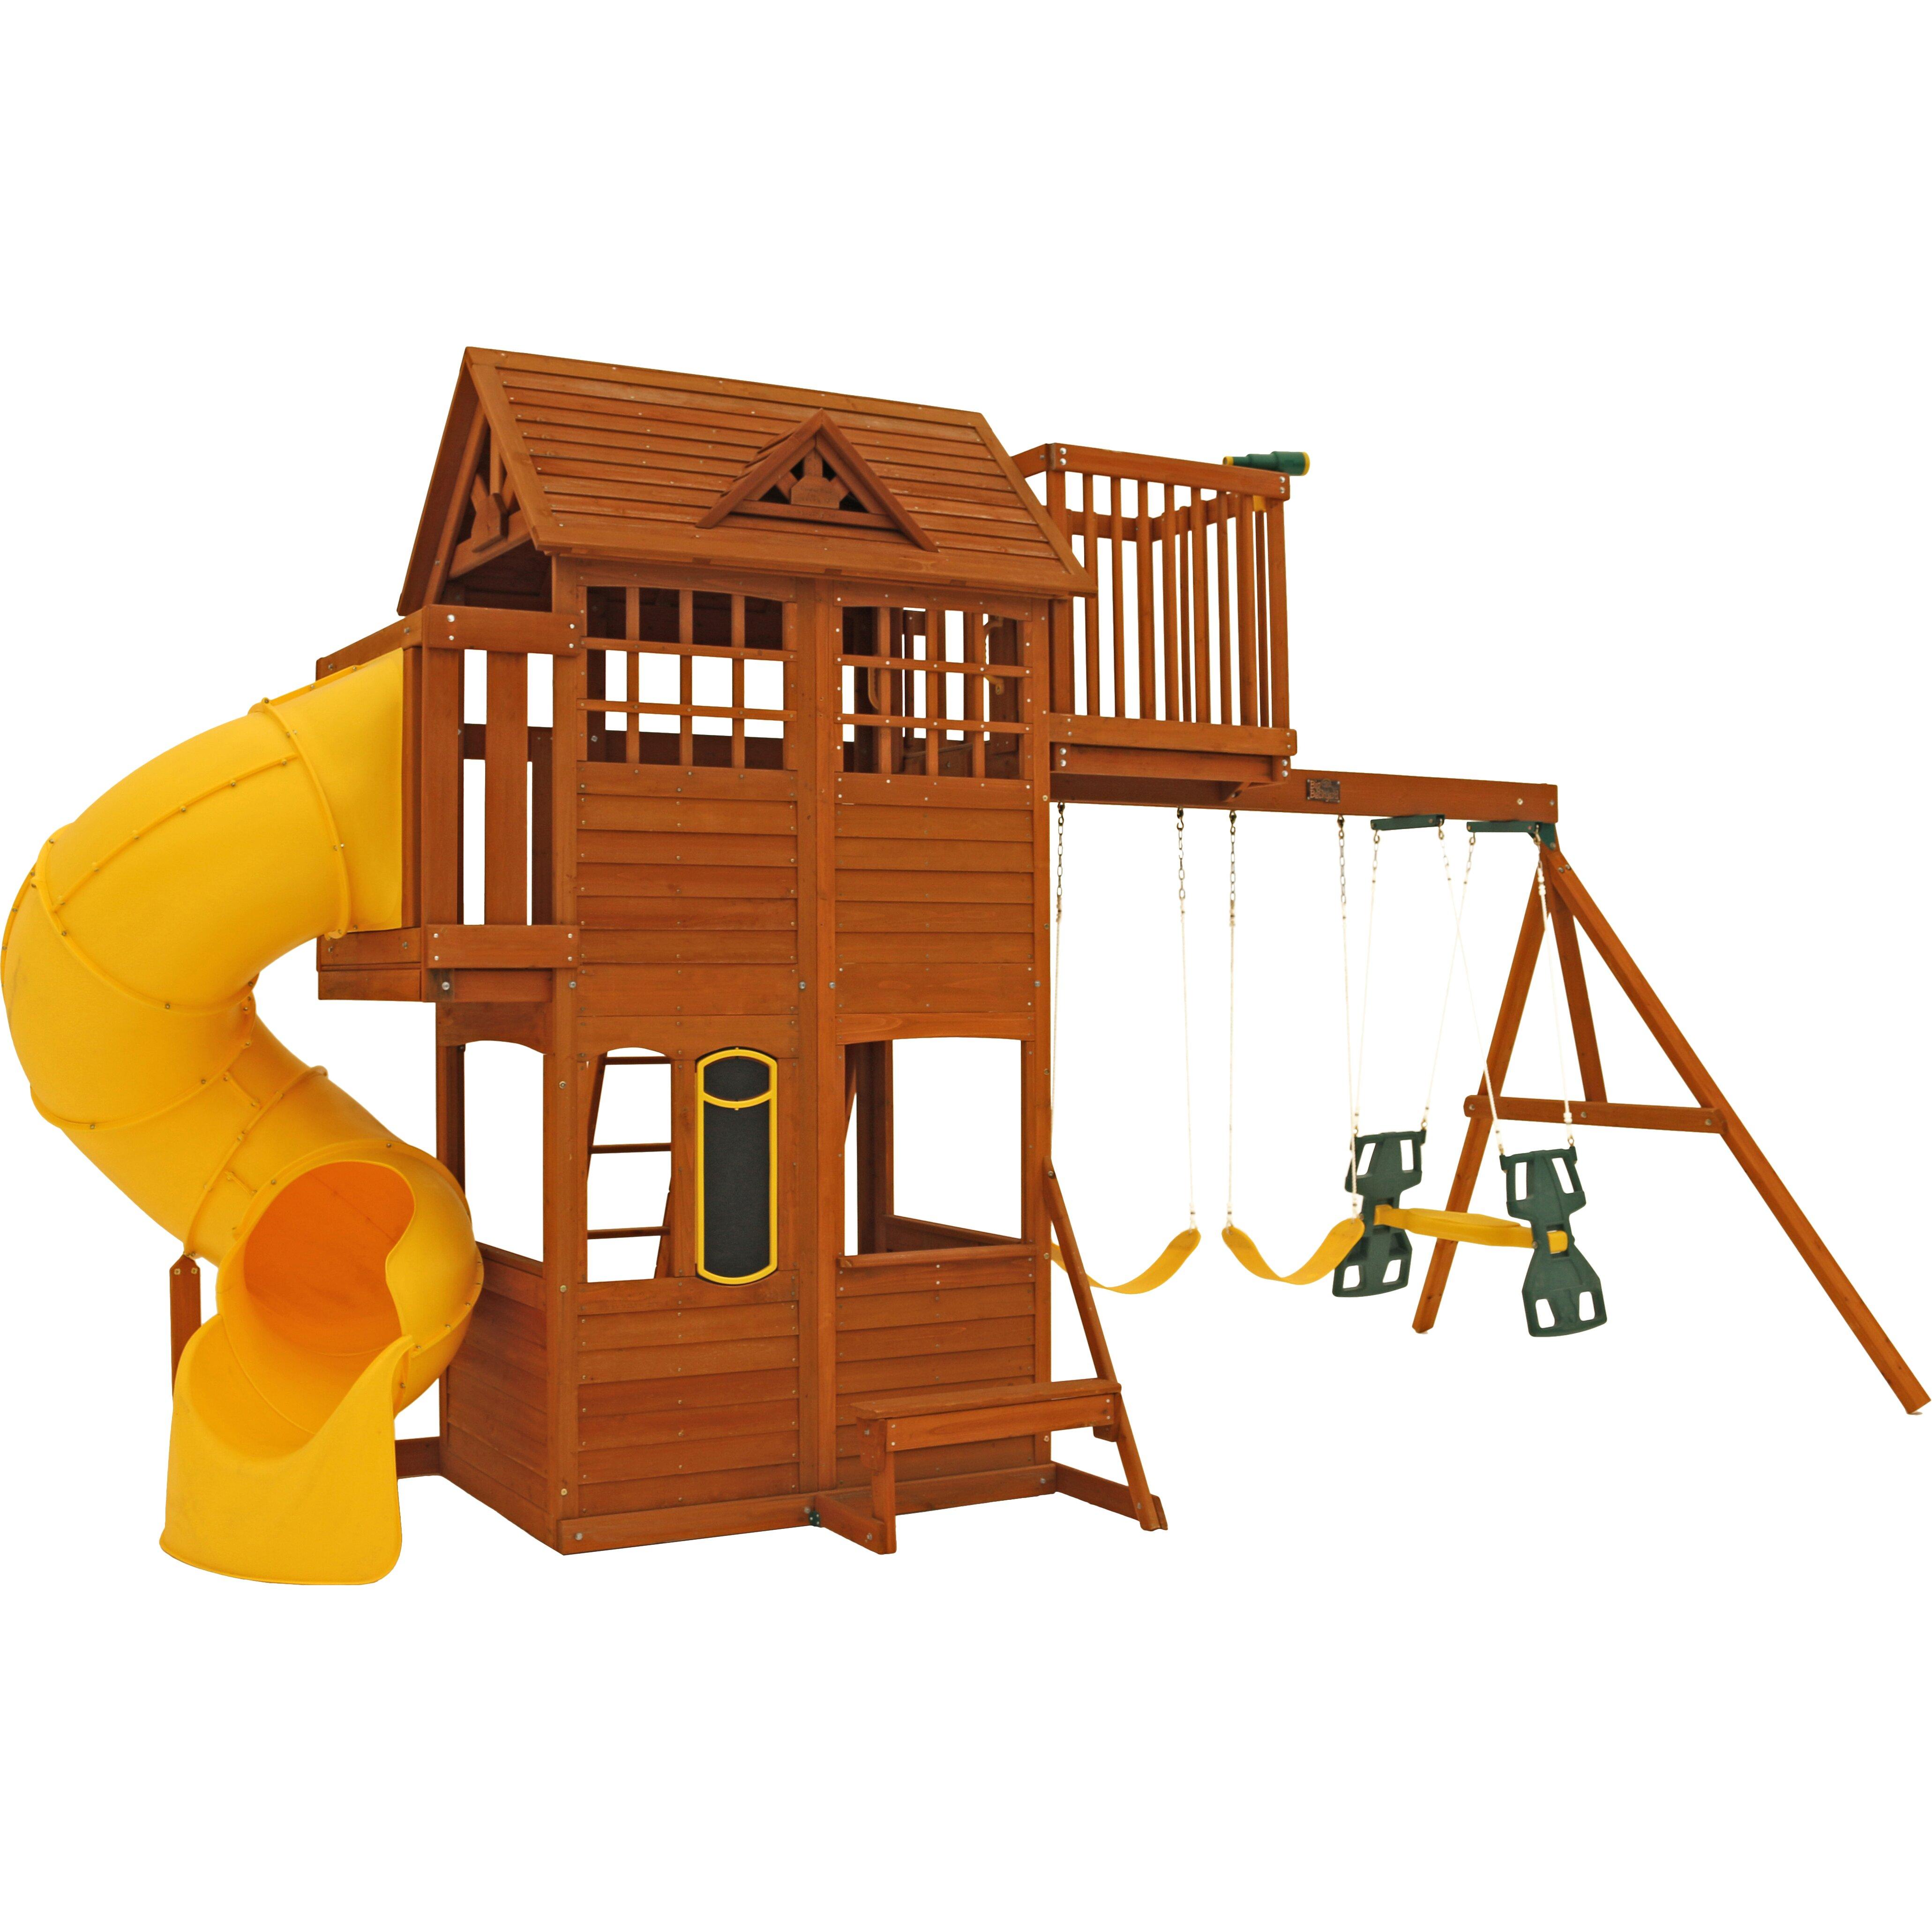 cedar summit abbeydale clubhouse wooden swing set. Black Bedroom Furniture Sets. Home Design Ideas